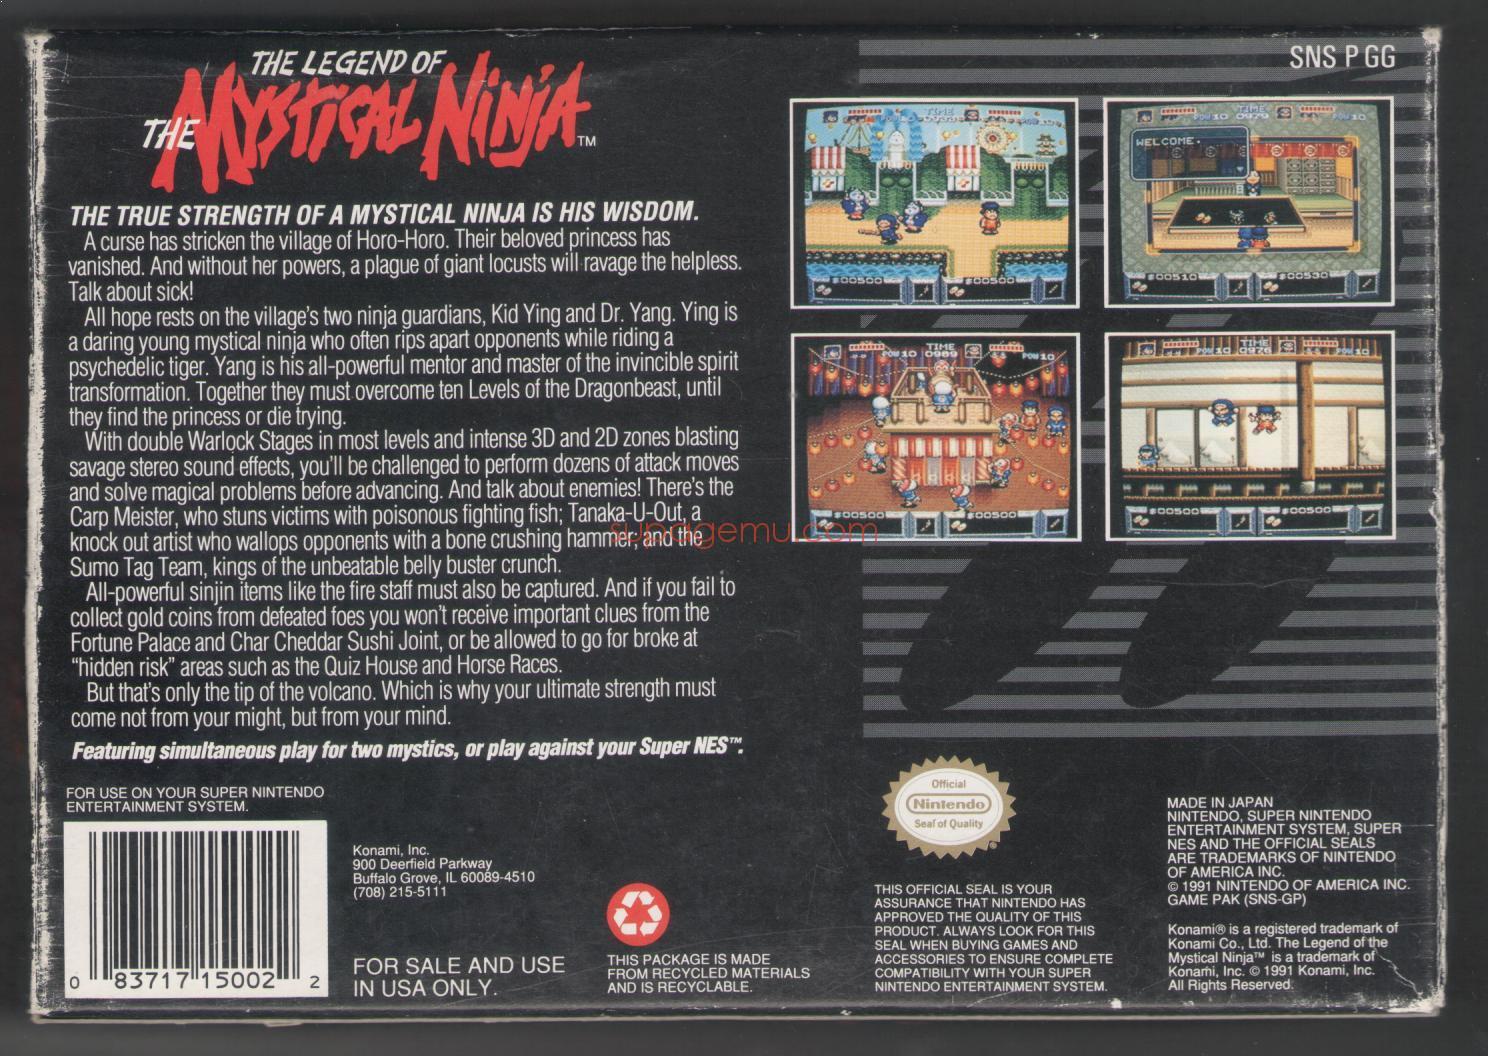 supagemu - The Legend of the Mystical Ninja review